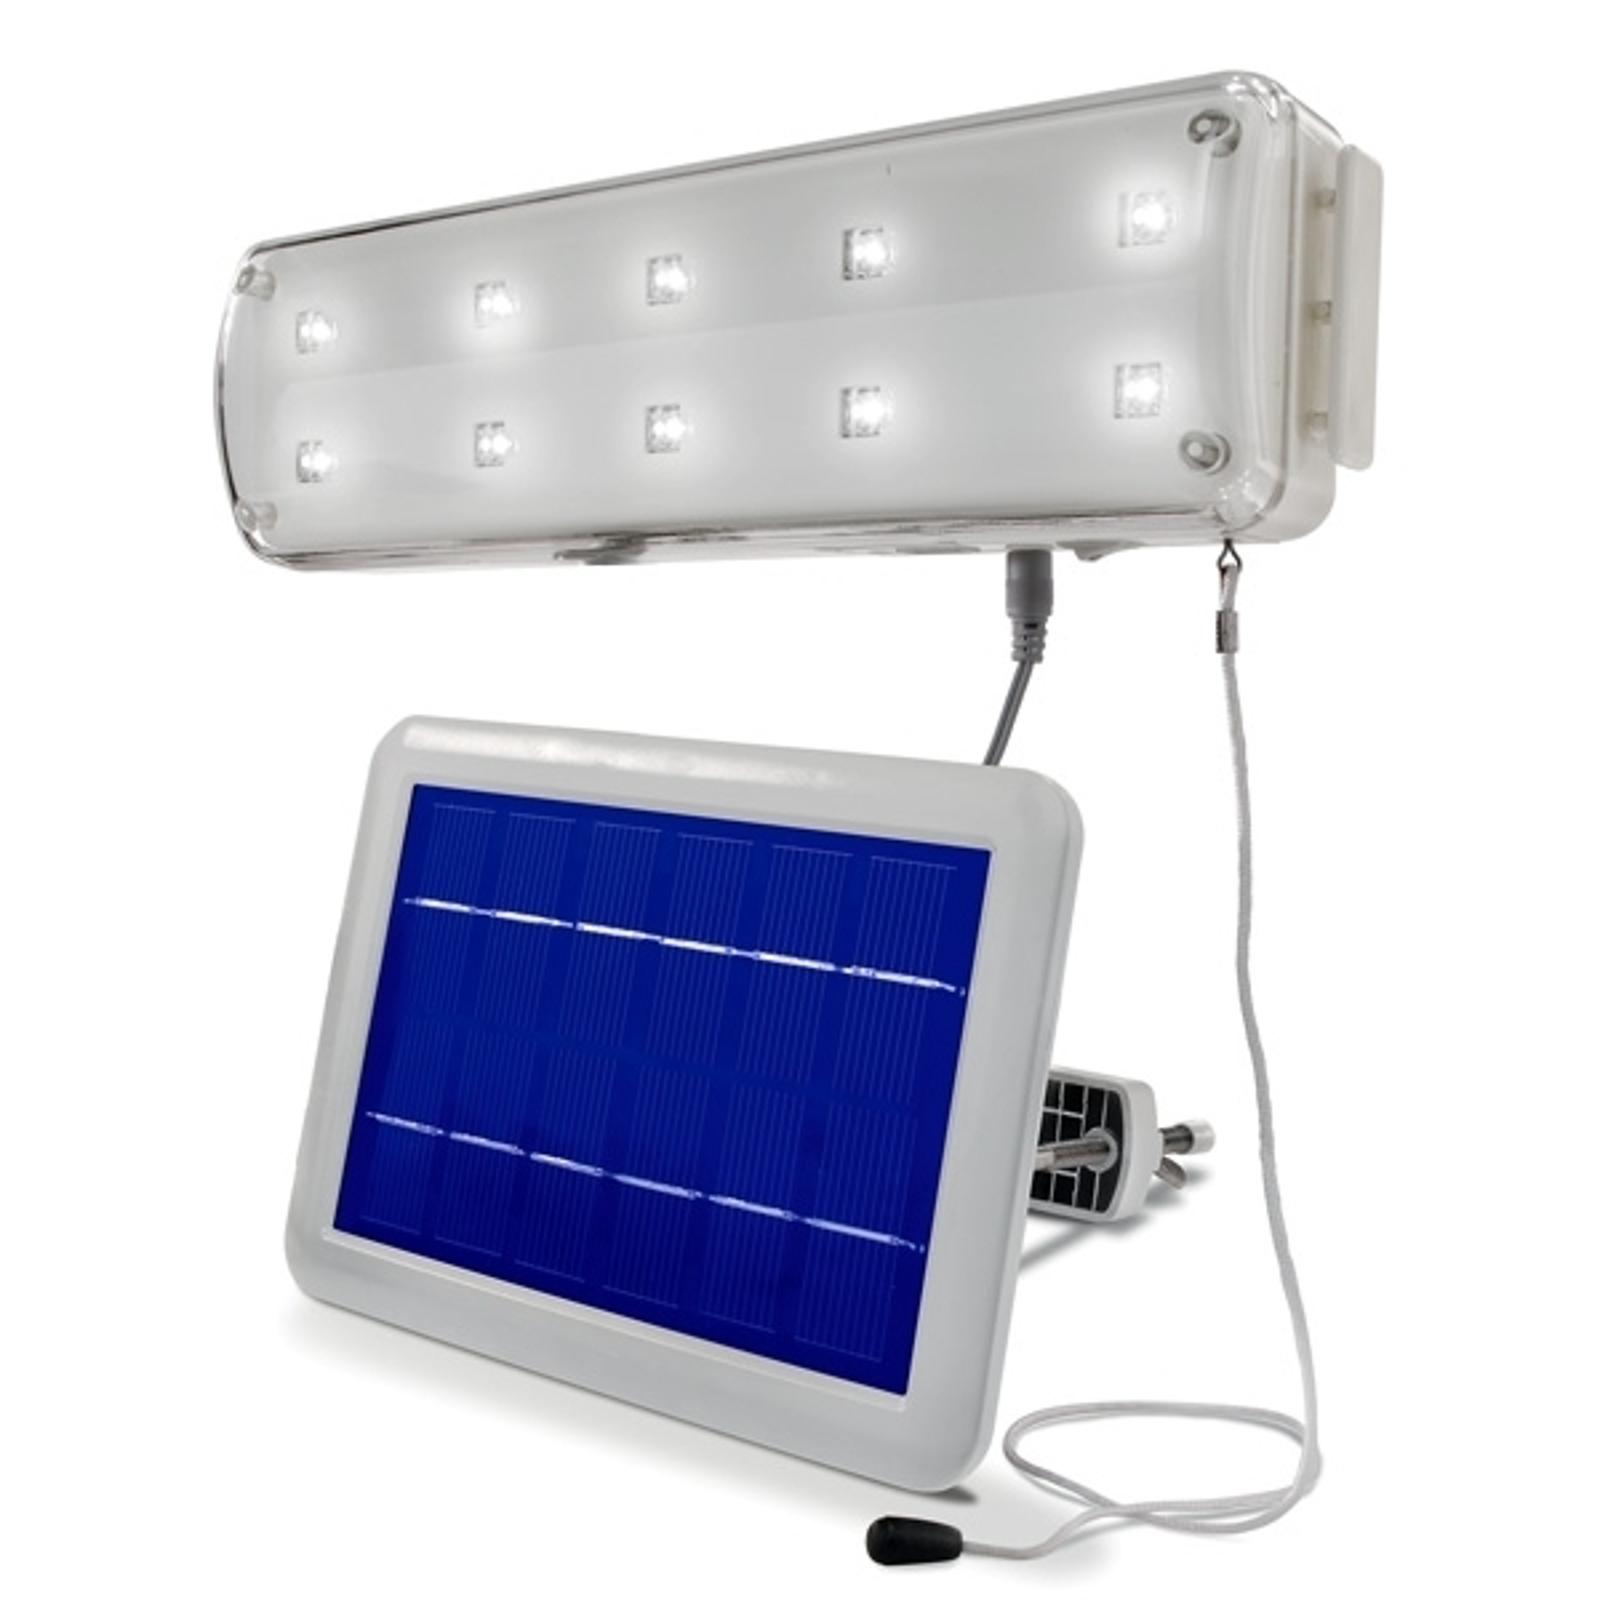 Solárny svetelný systém s detektorom pohybu